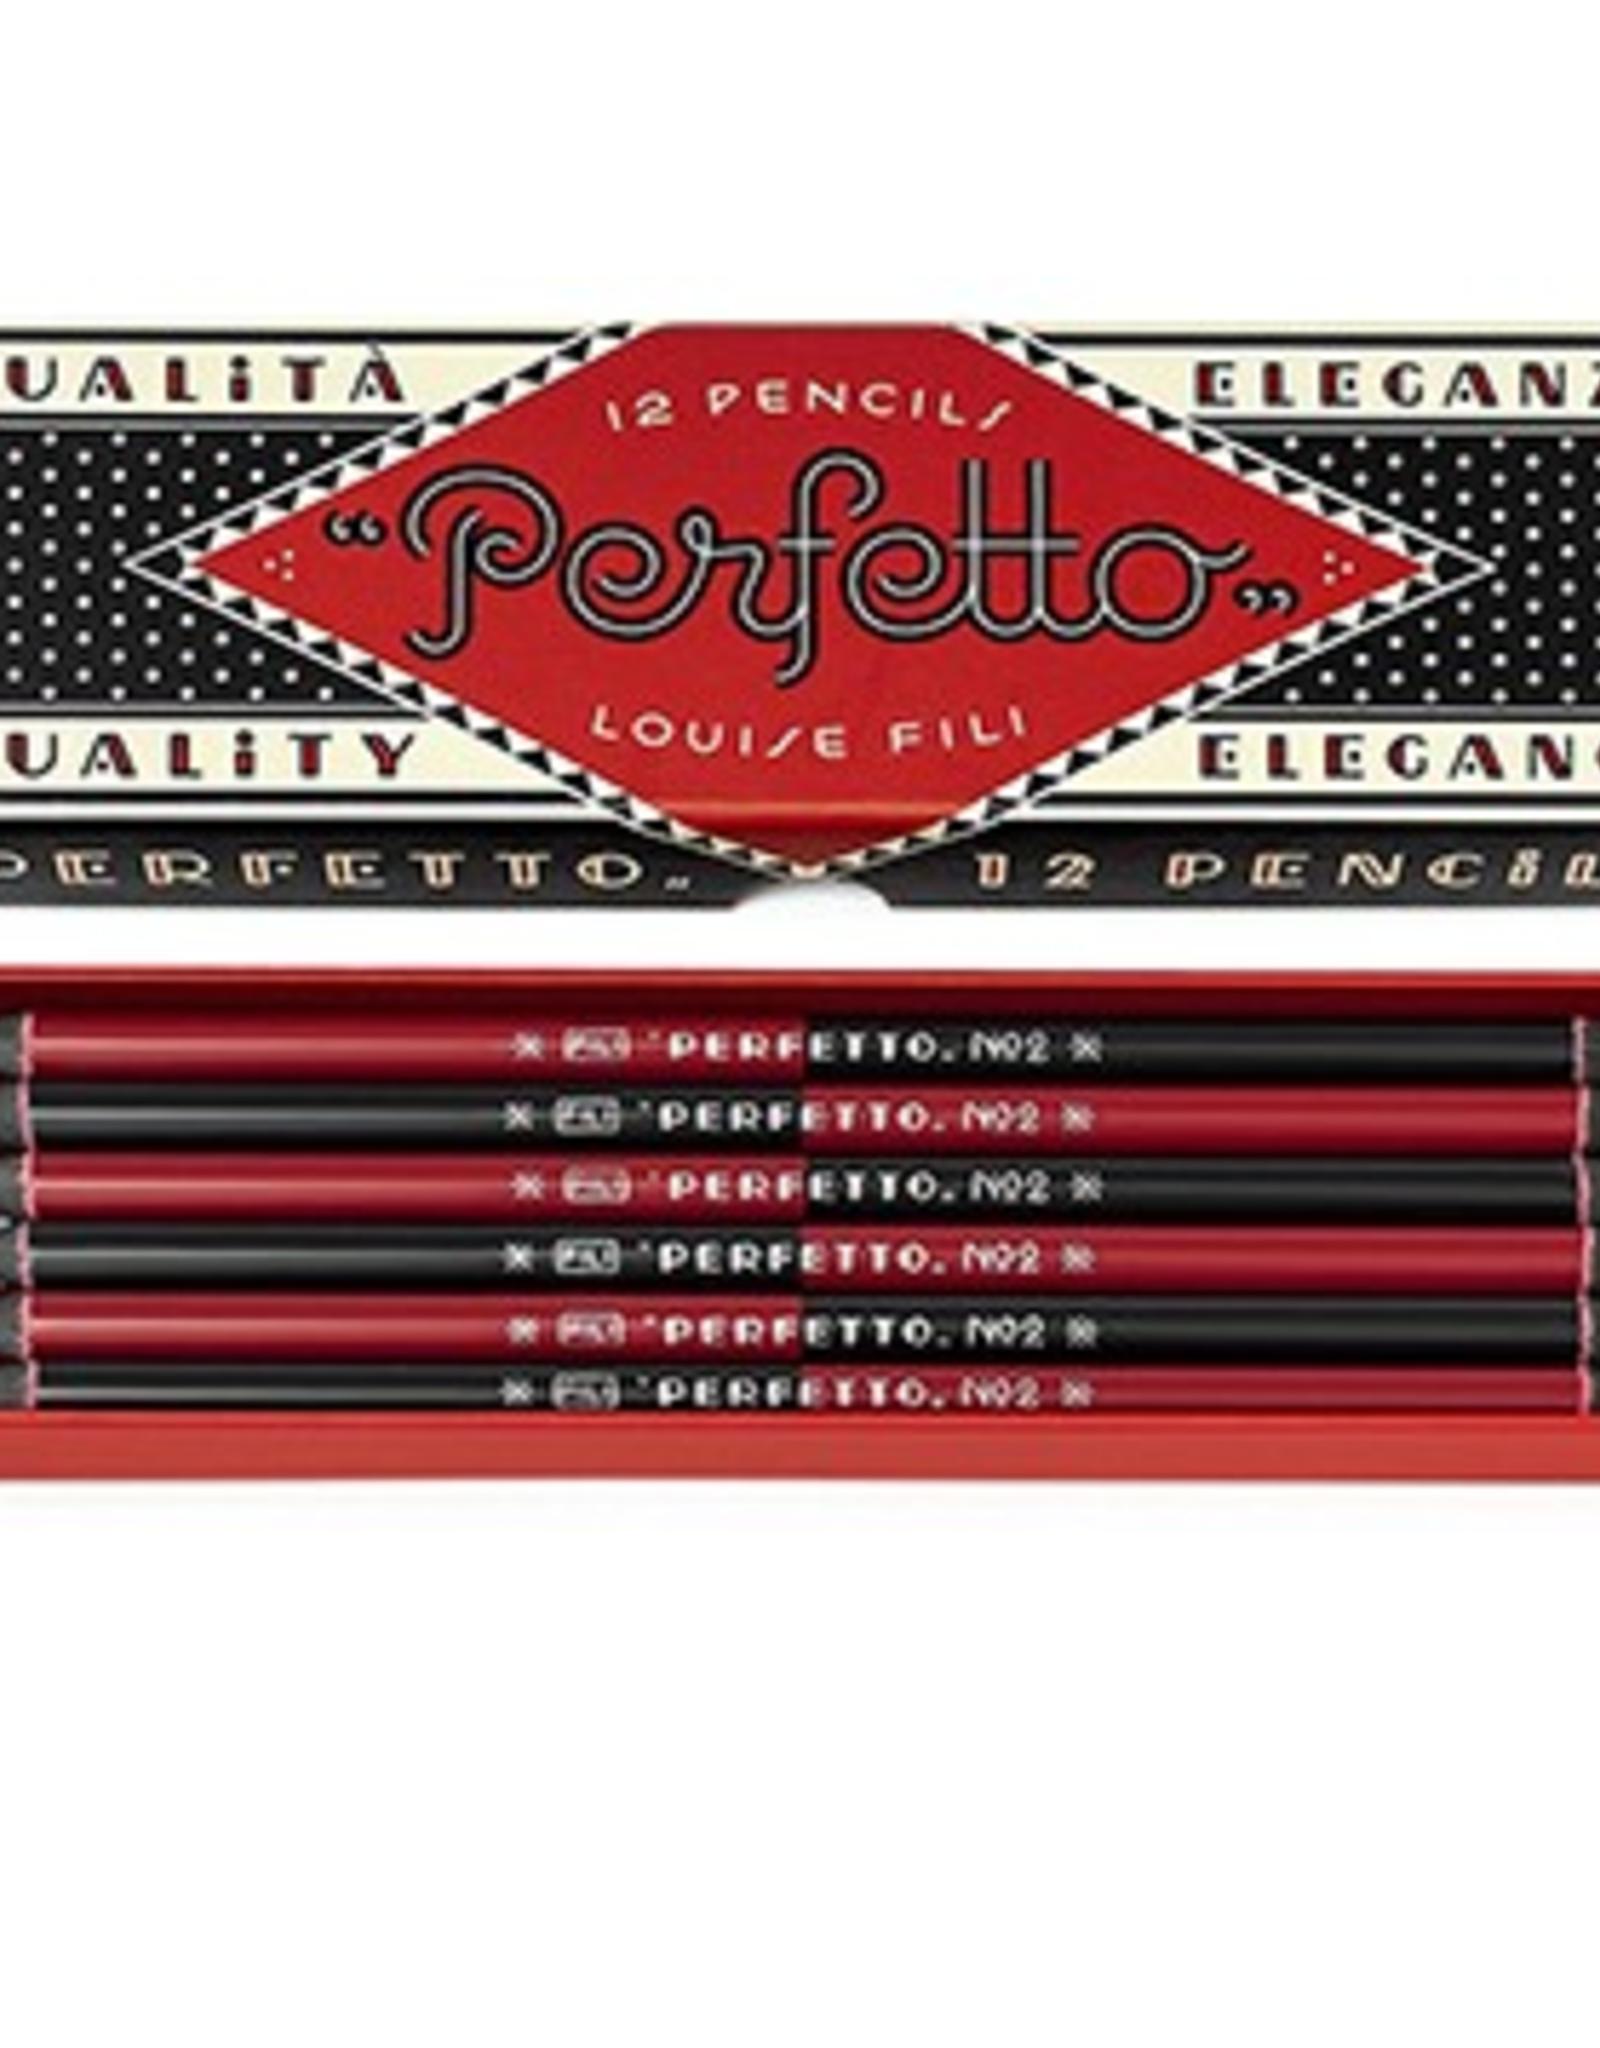 Perfetto Pencils - Louise Fili (Set of 12)